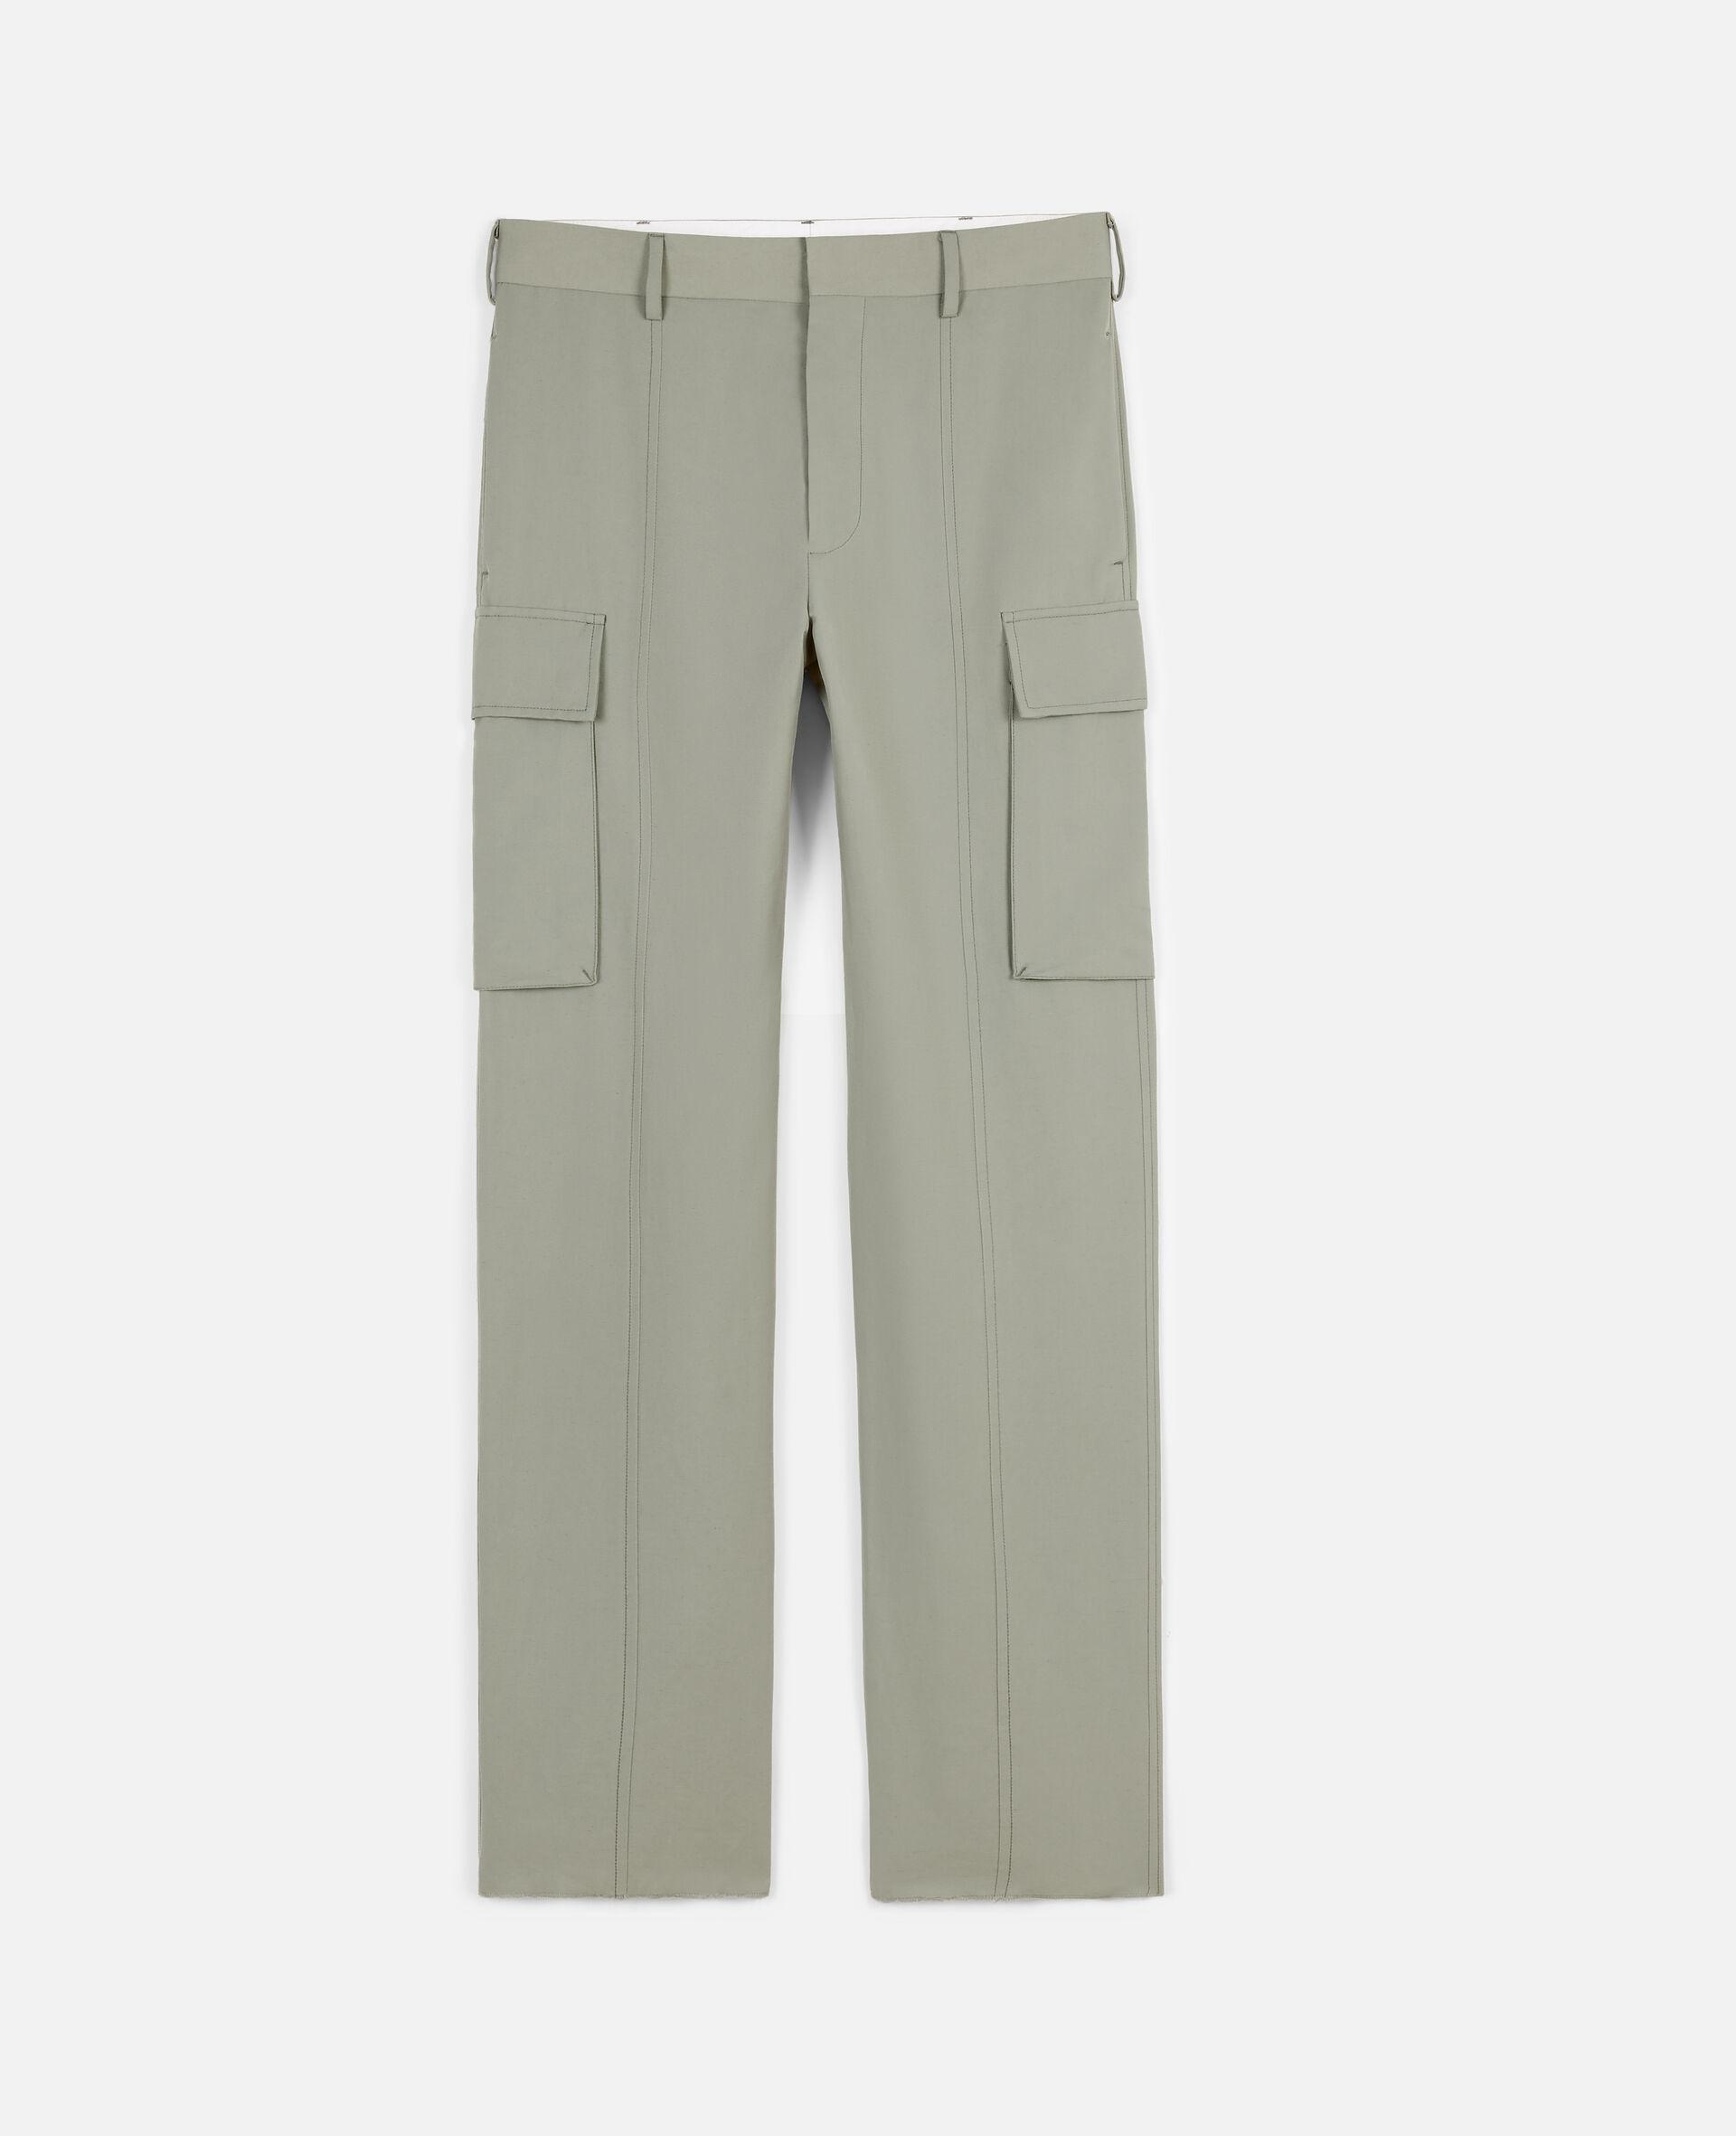 Khaki Pants-Green-large image number 0